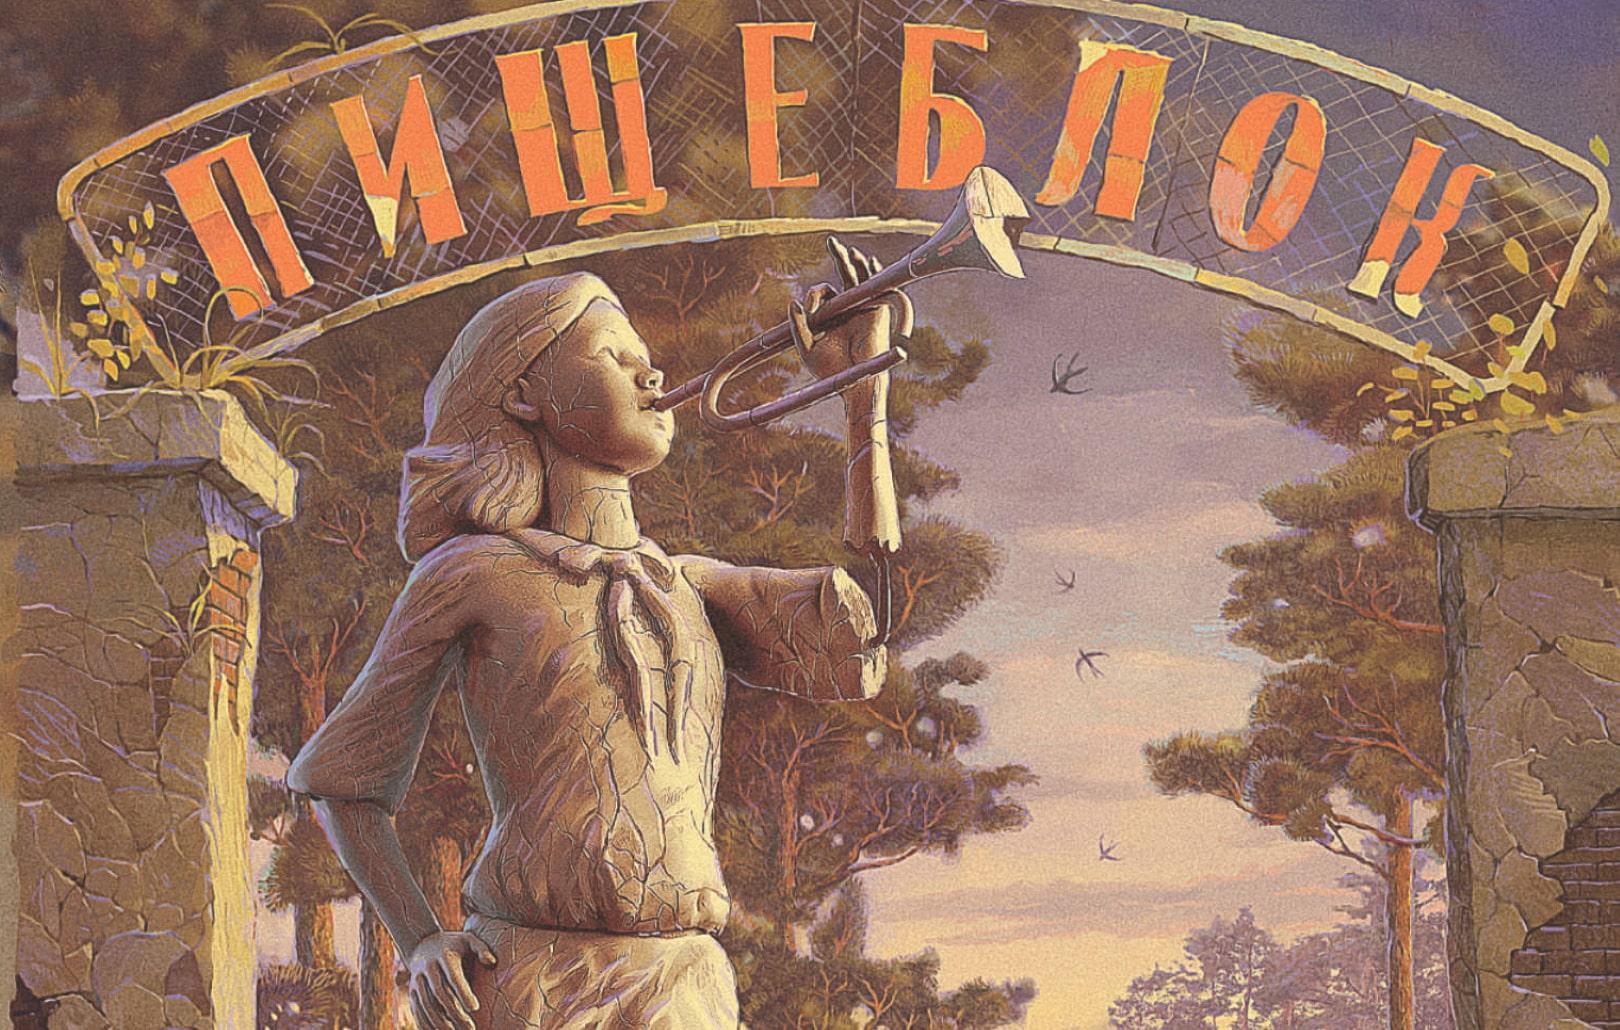 Алексей Иванов: аудиокниги